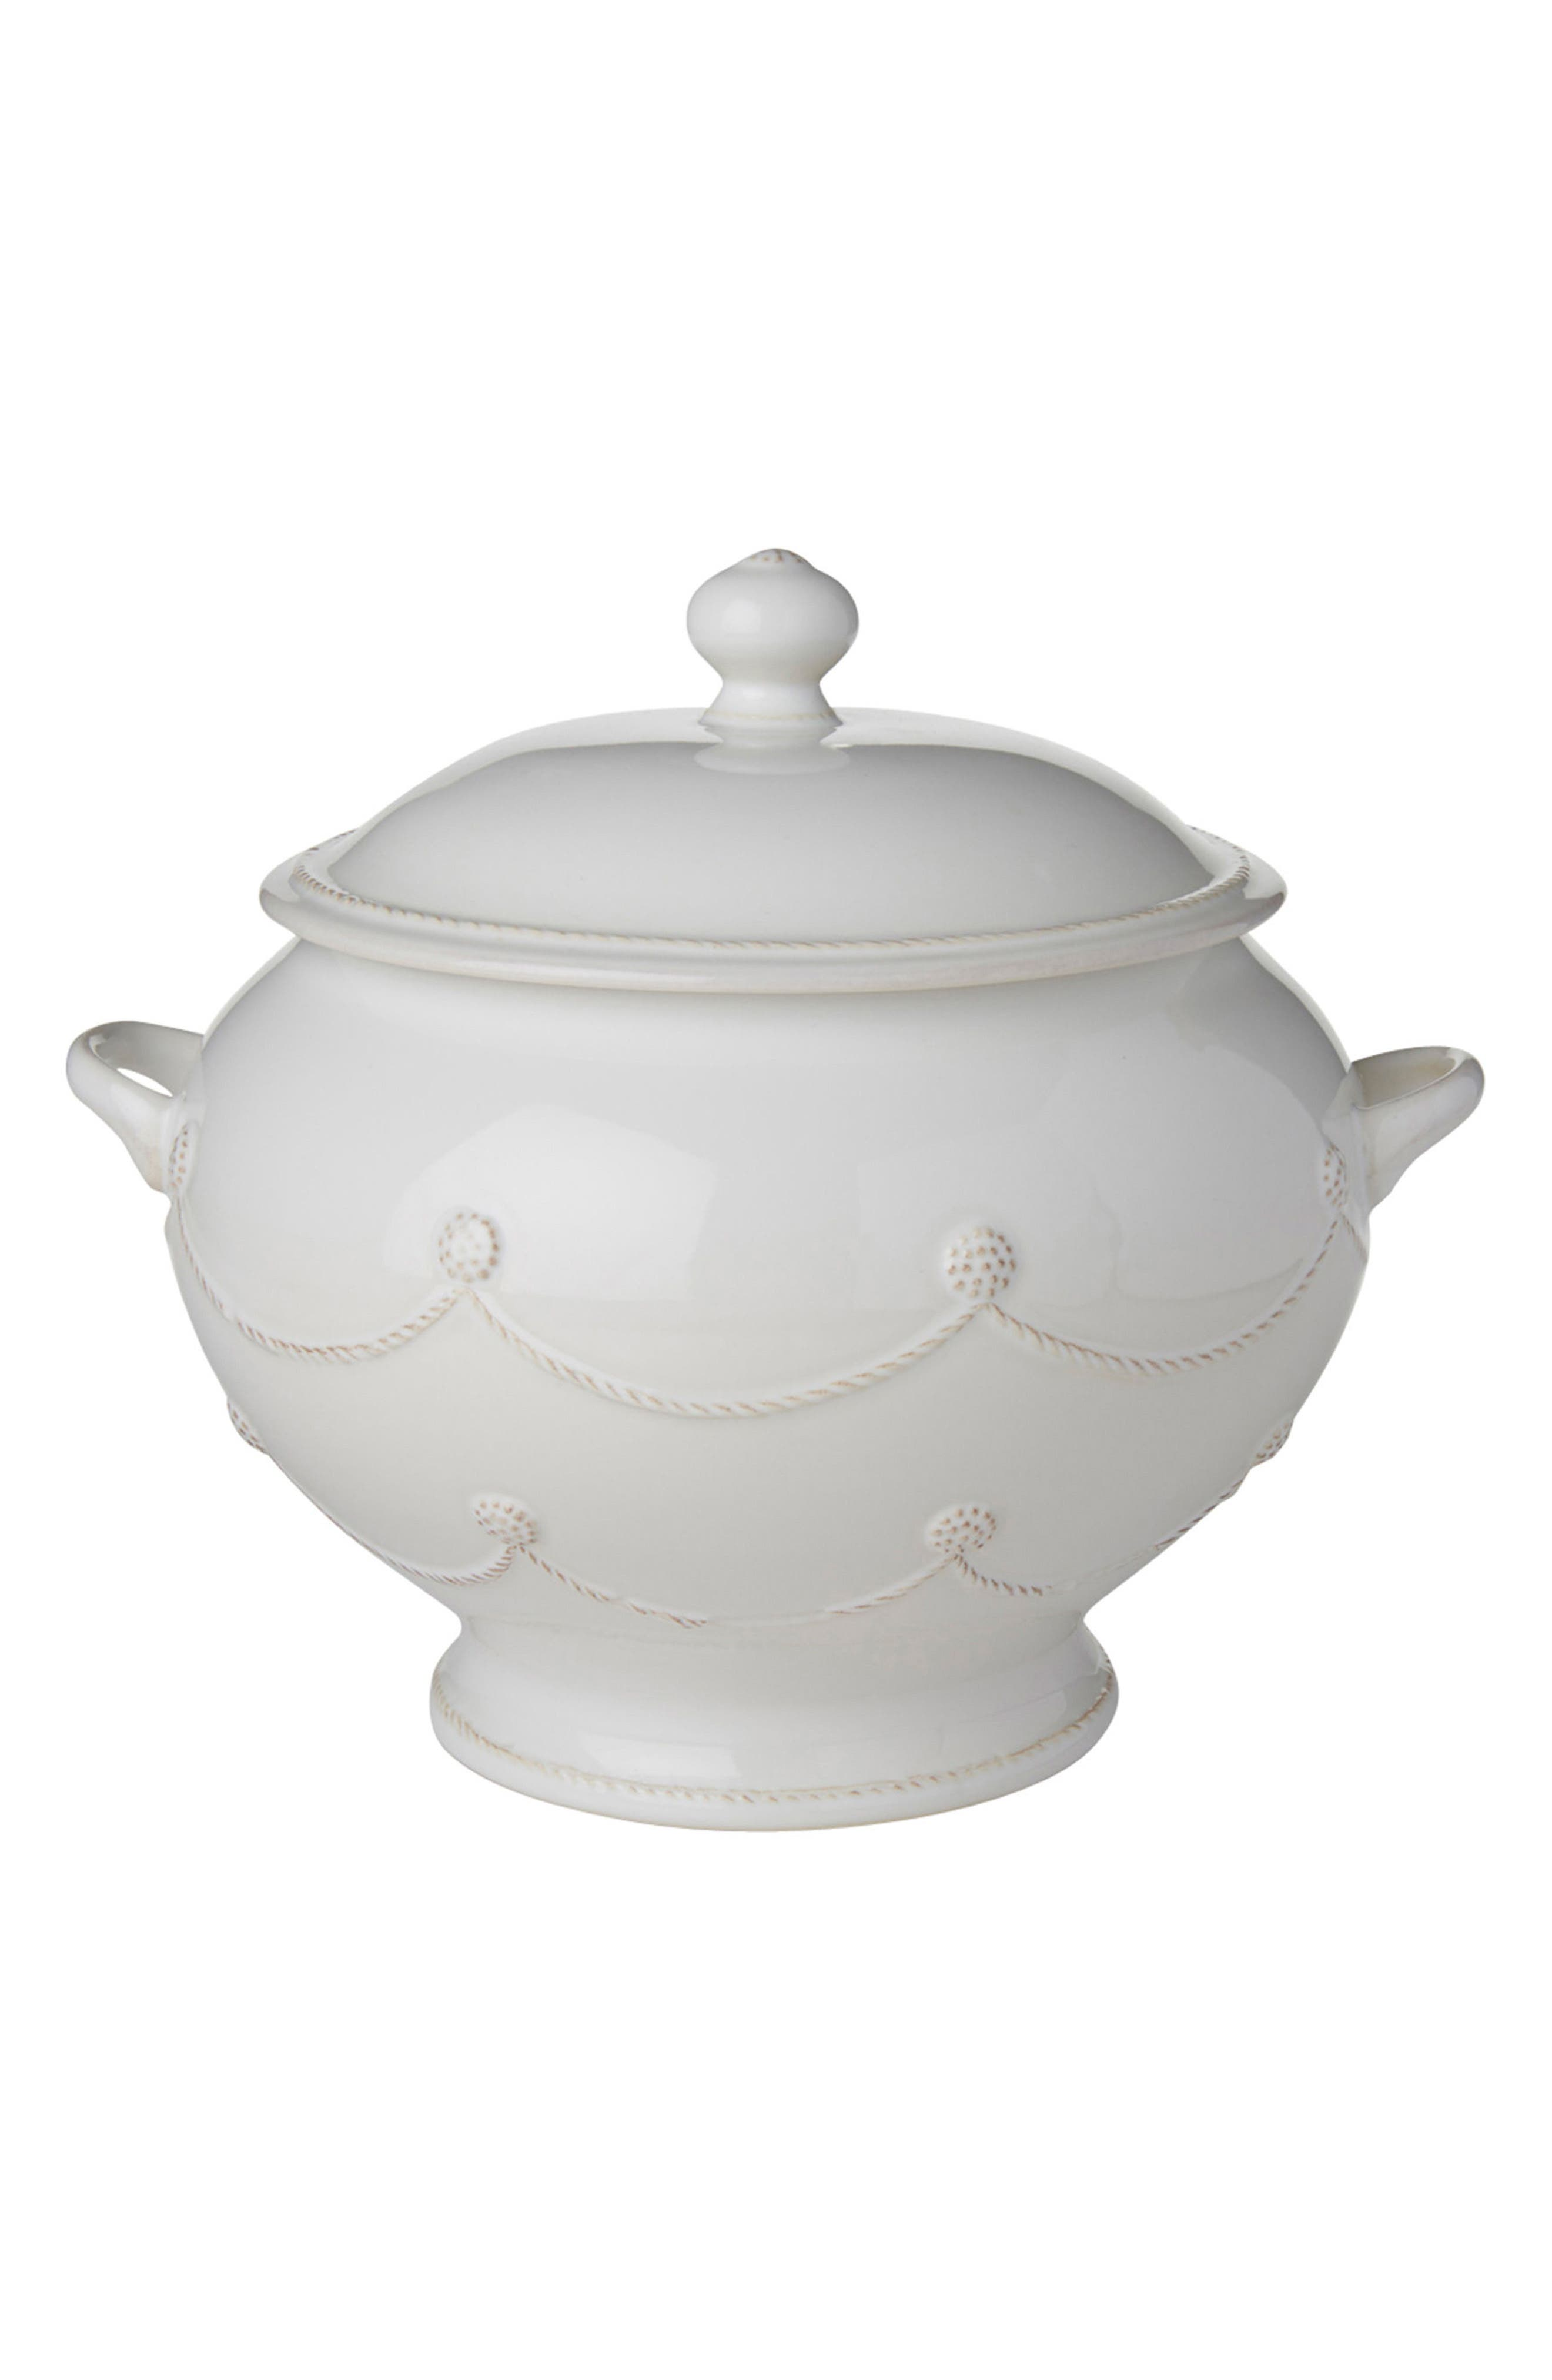 Berry & Thread Ceramic Soup Tureen,                         Main,                         color, WHITEWASH